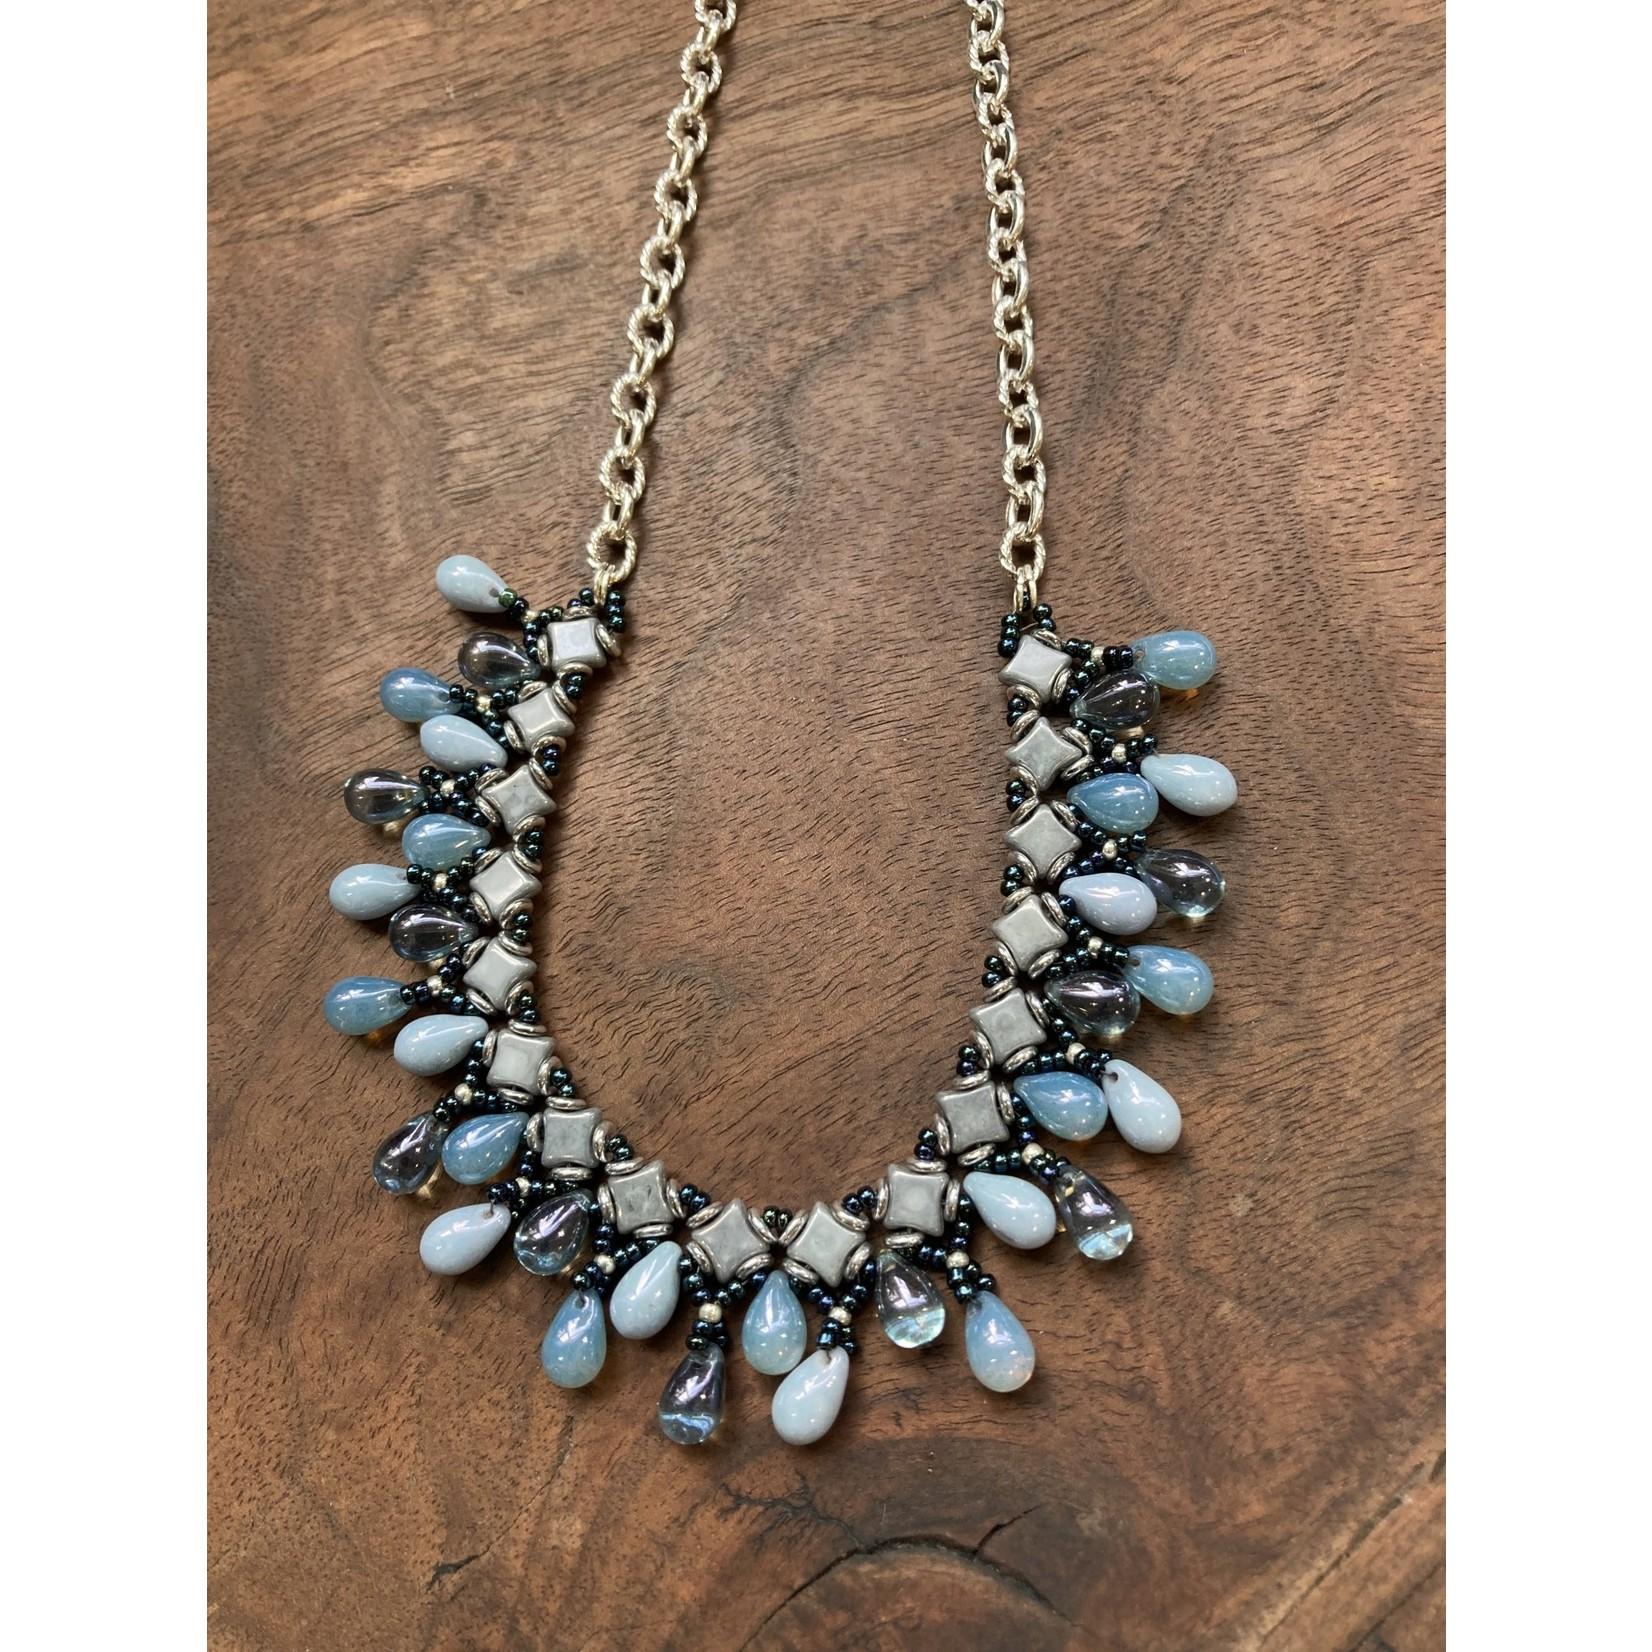 Jeanne Shuff Jeanne Marie Jewelry | #11 Beaded Center Collar Necklace w. Drops on Chain